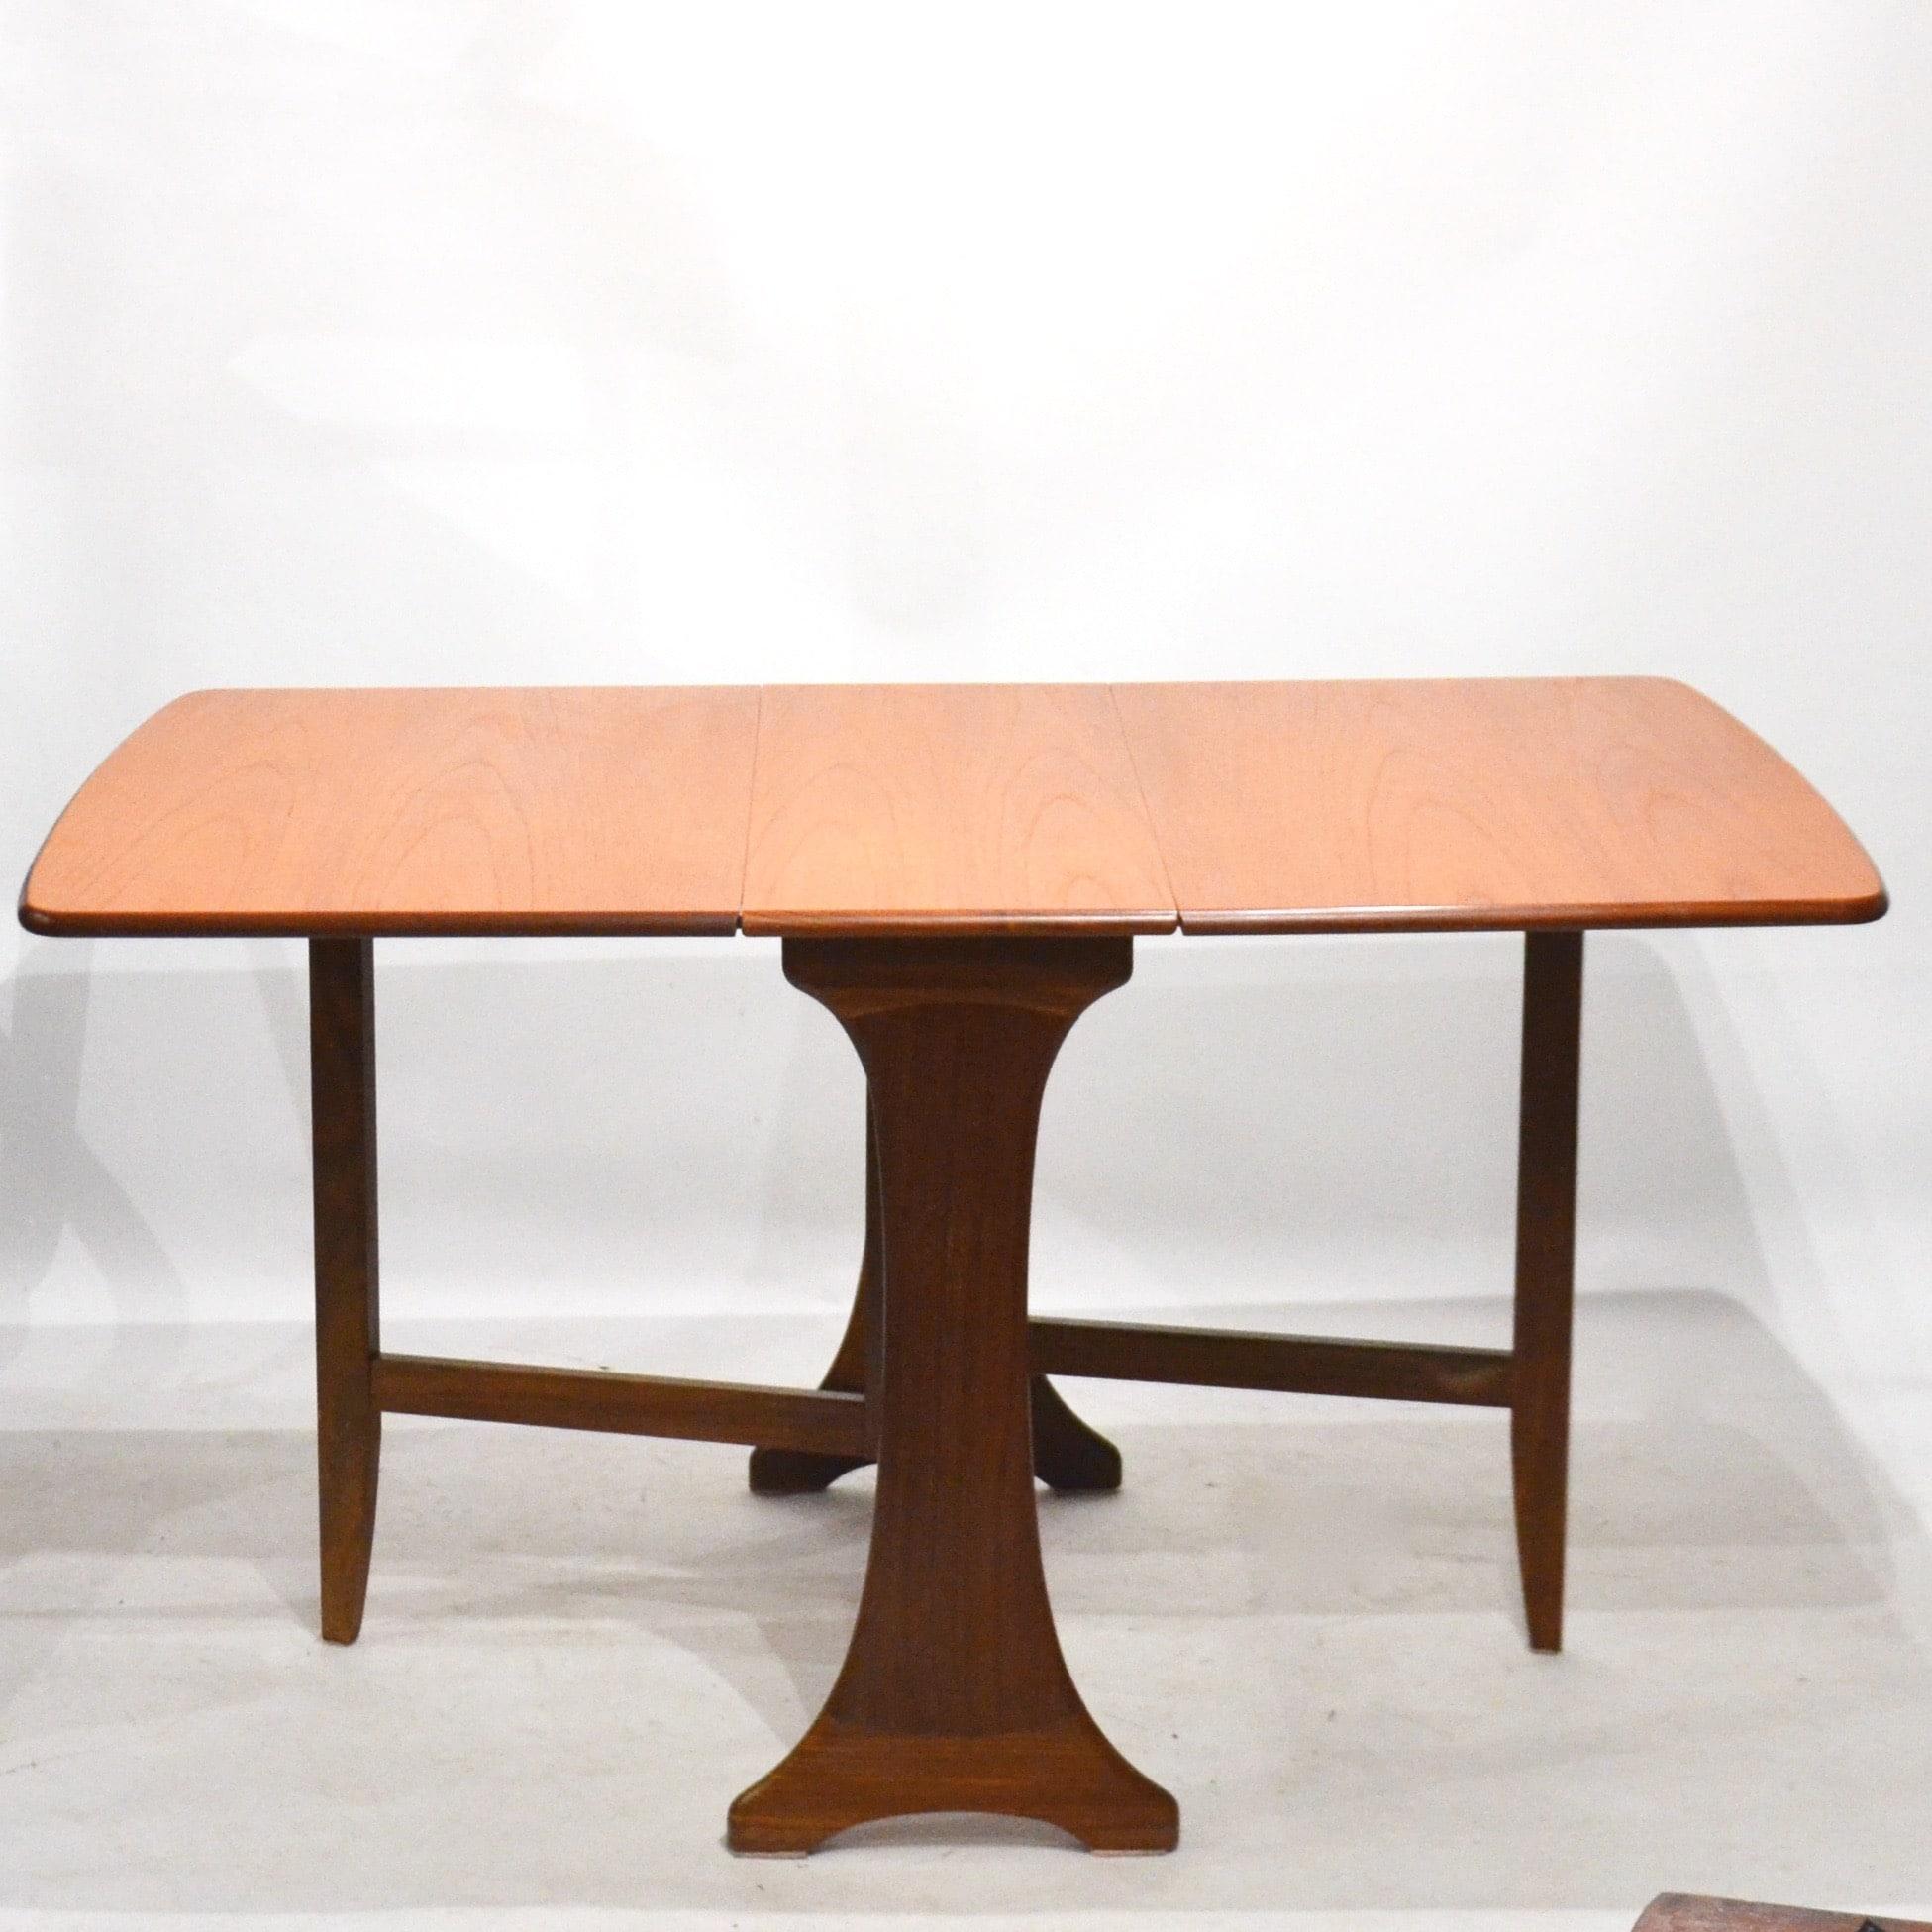 table manger modulable scandinave bindiesbindies. Black Bedroom Furniture Sets. Home Design Ideas